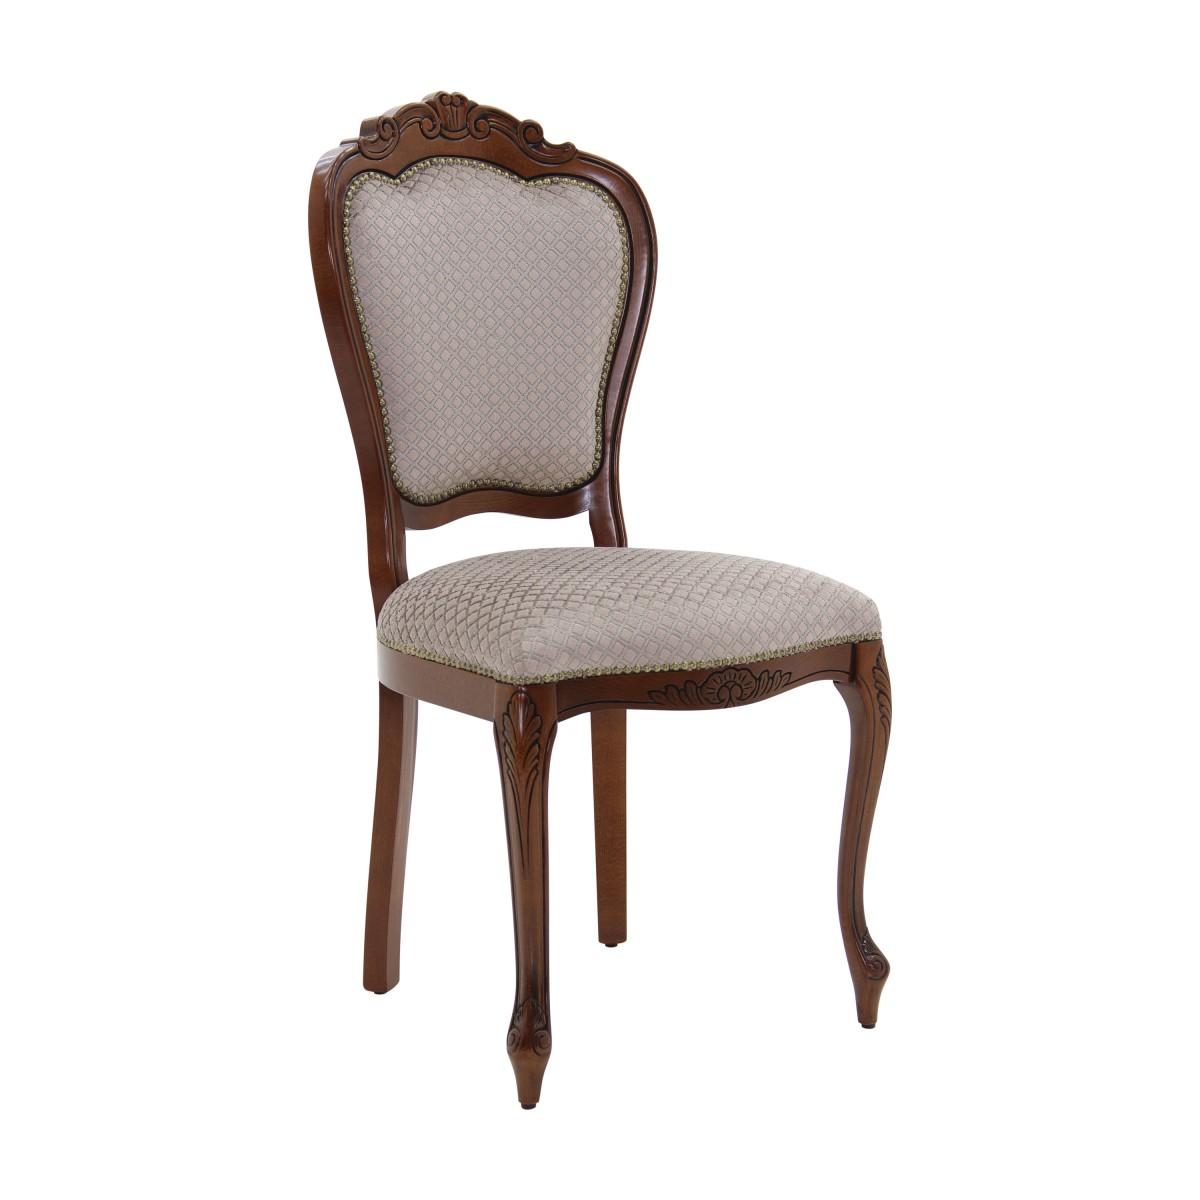 italian chair miledi 4280